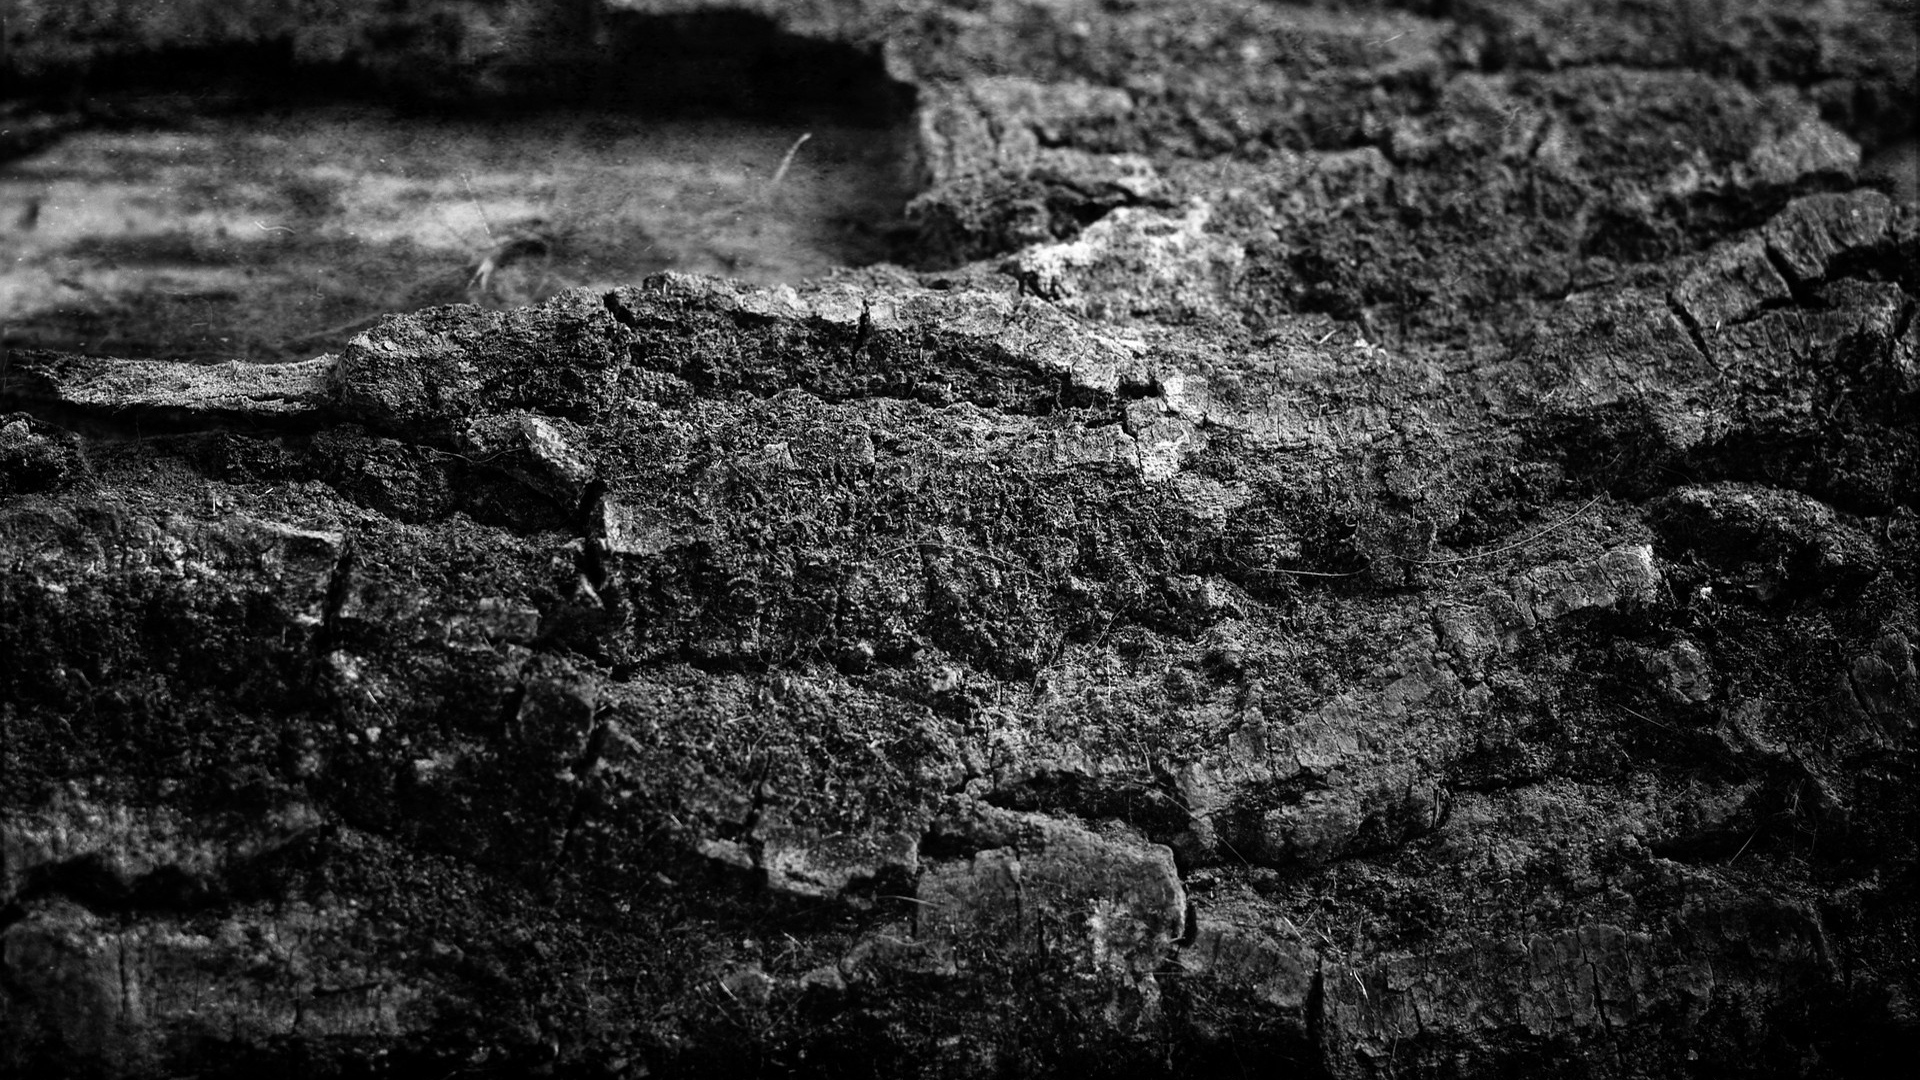 hd wallpapers black stones - photo #4